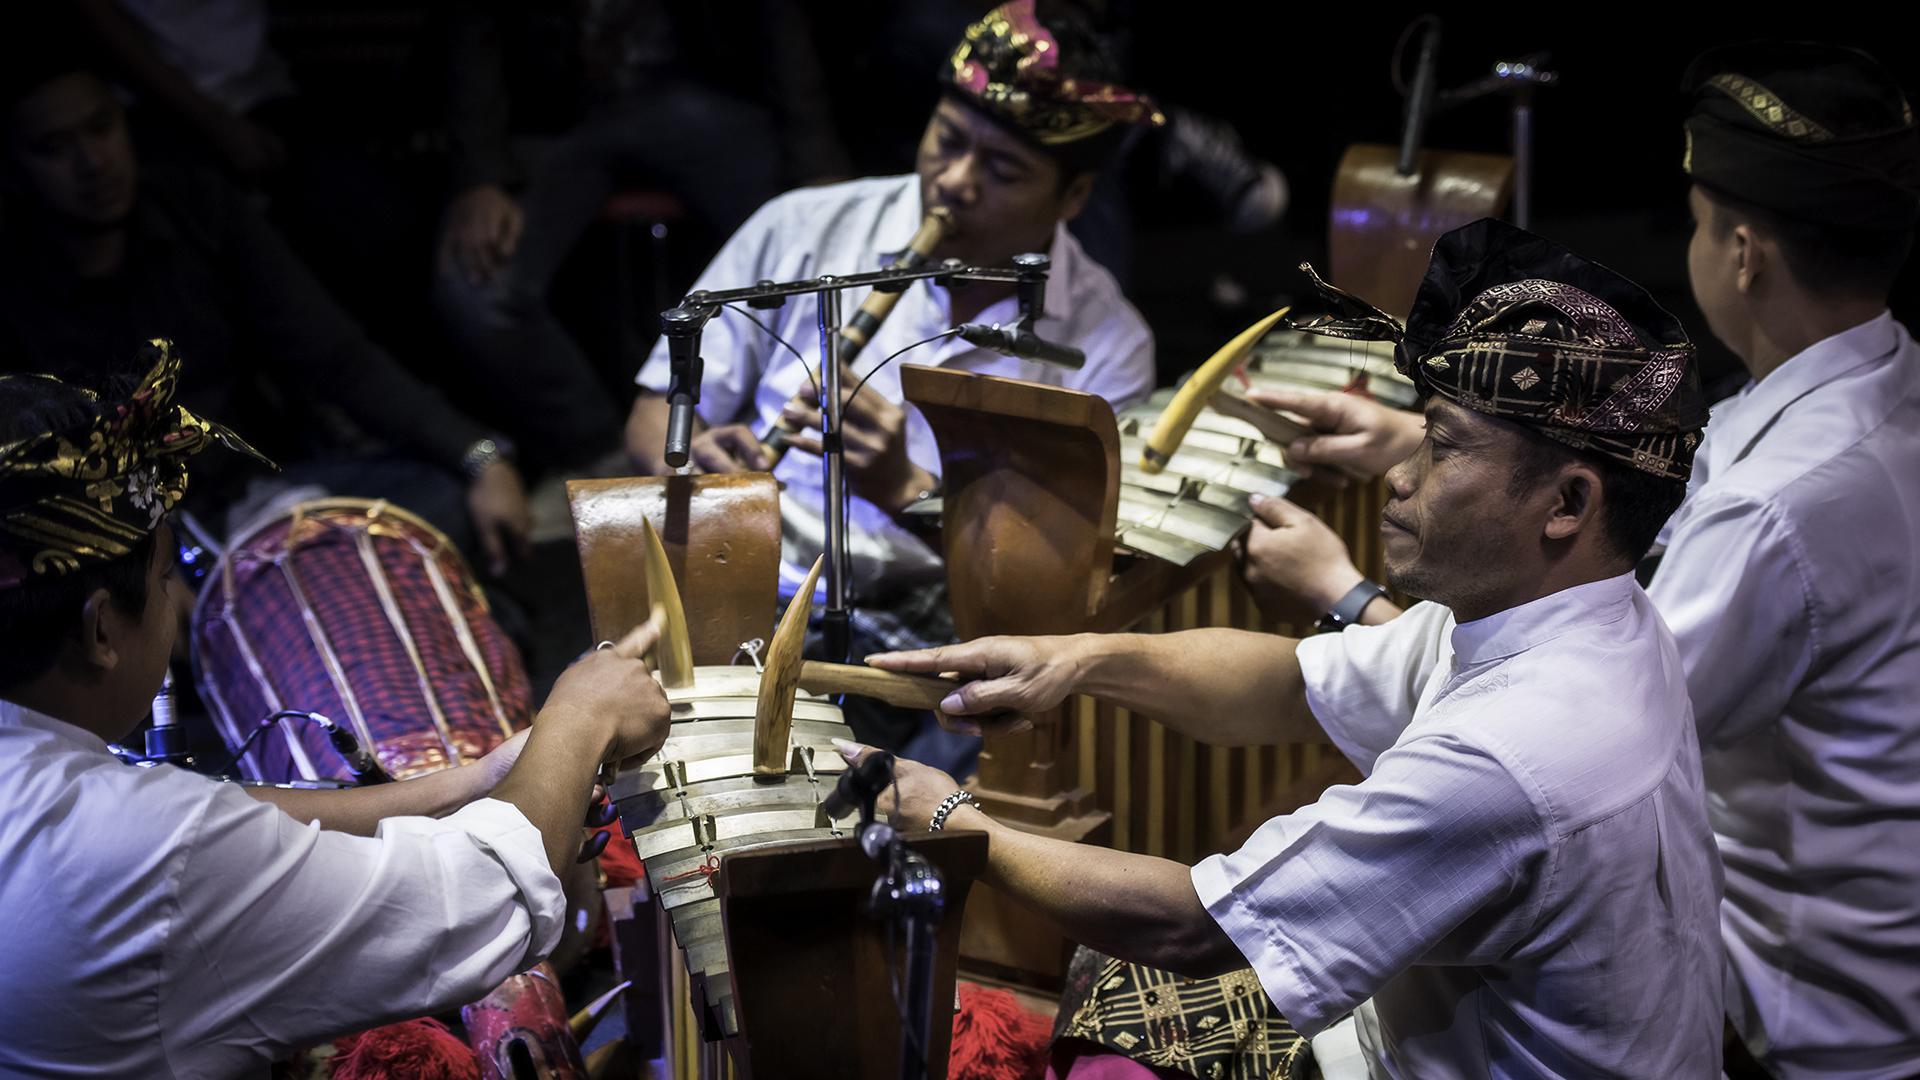 The Balinese Art Foundation of Saraswati